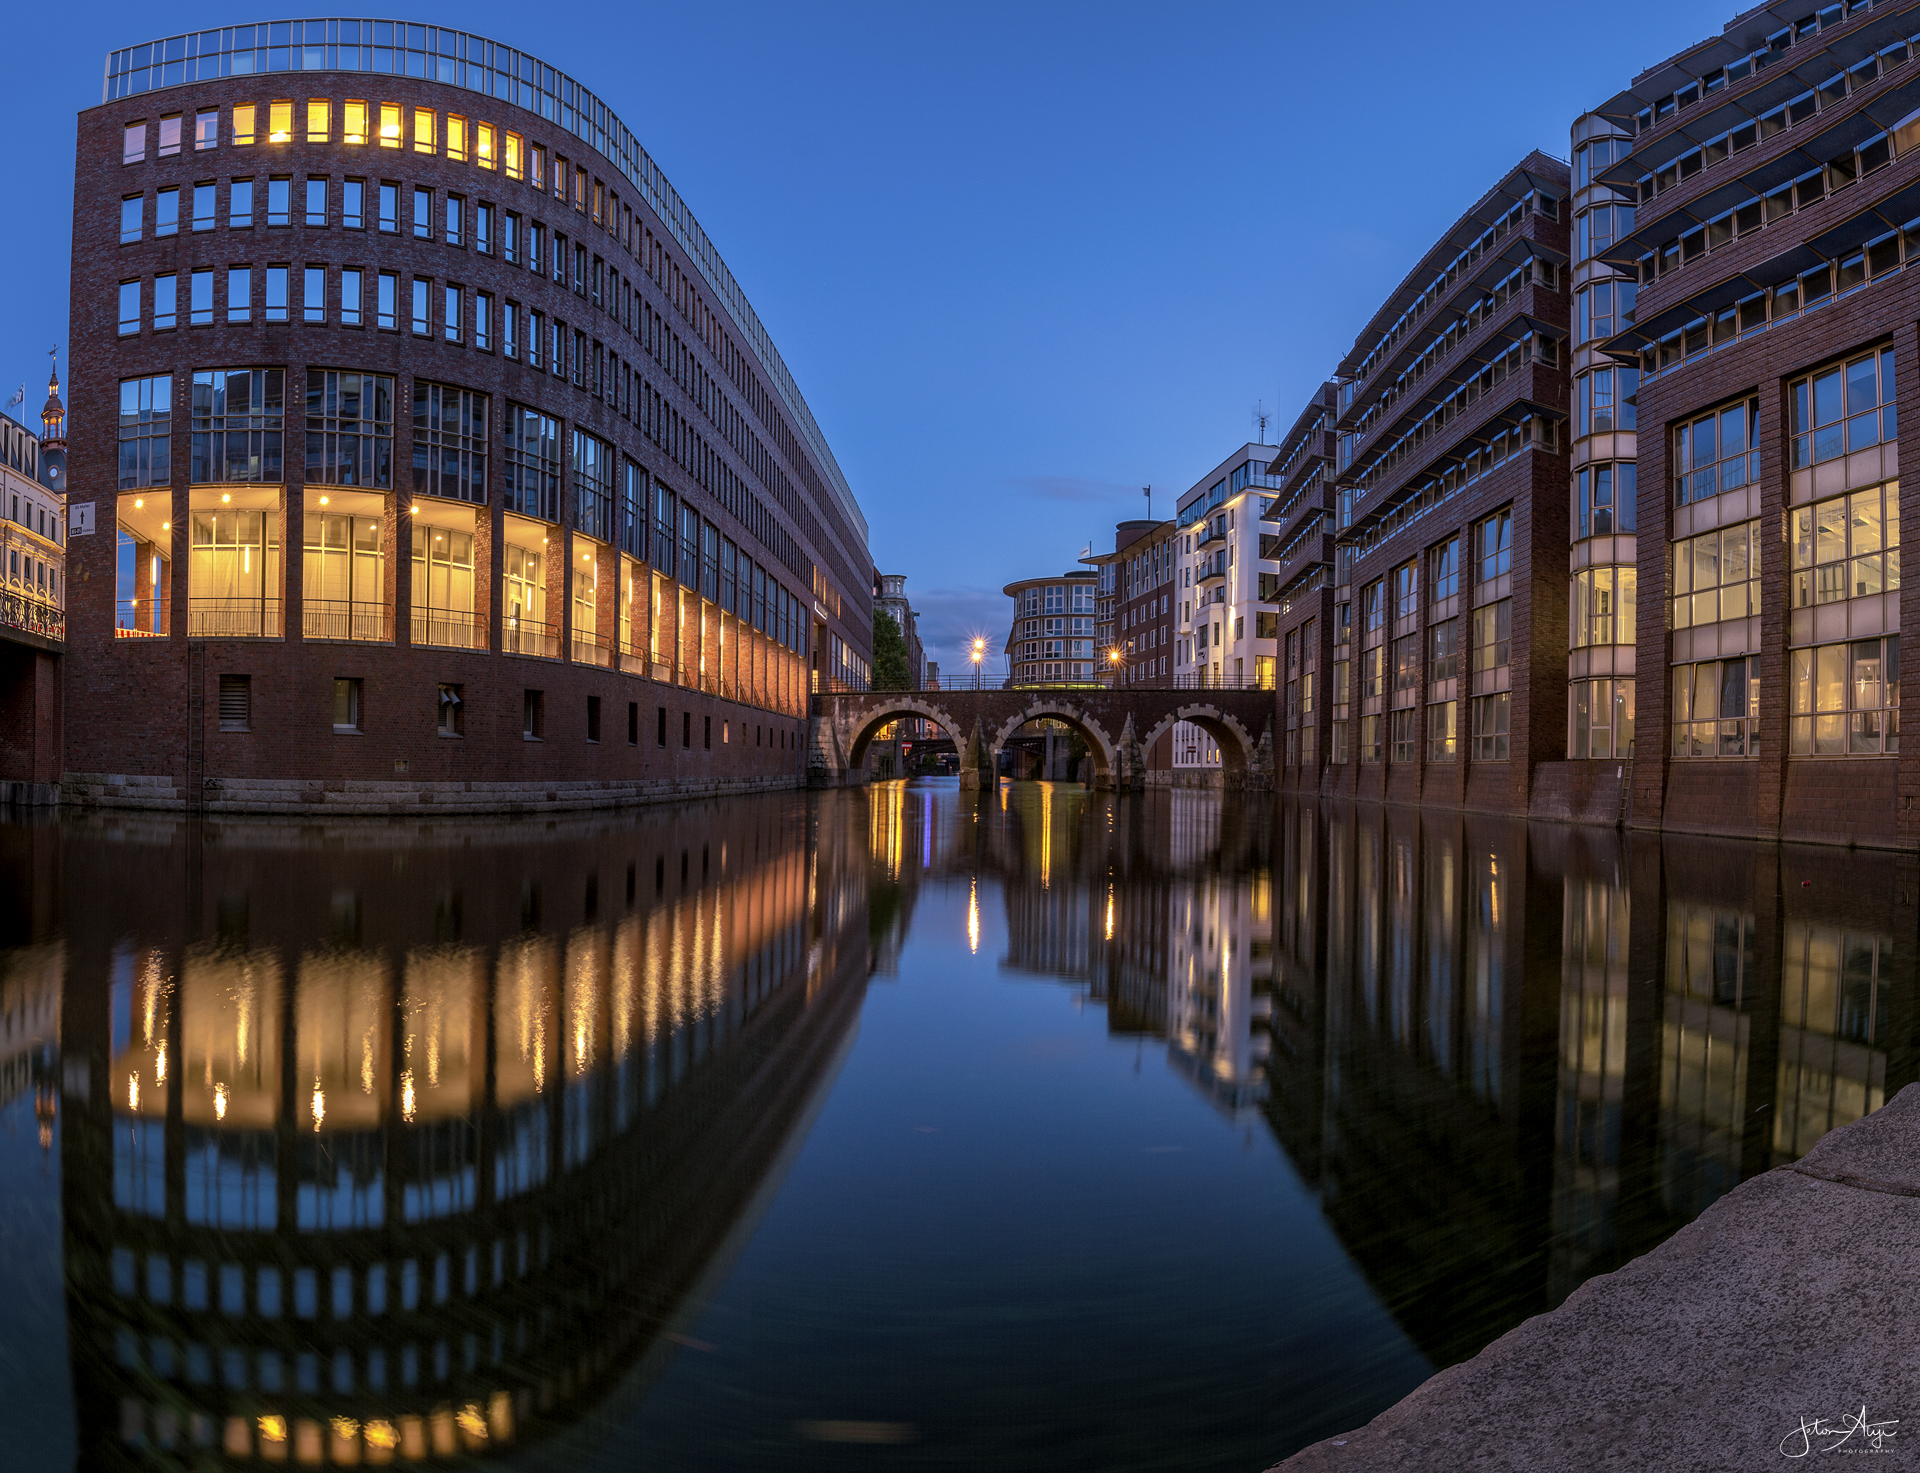 Stadthausbrücke, Hamburg, Germany